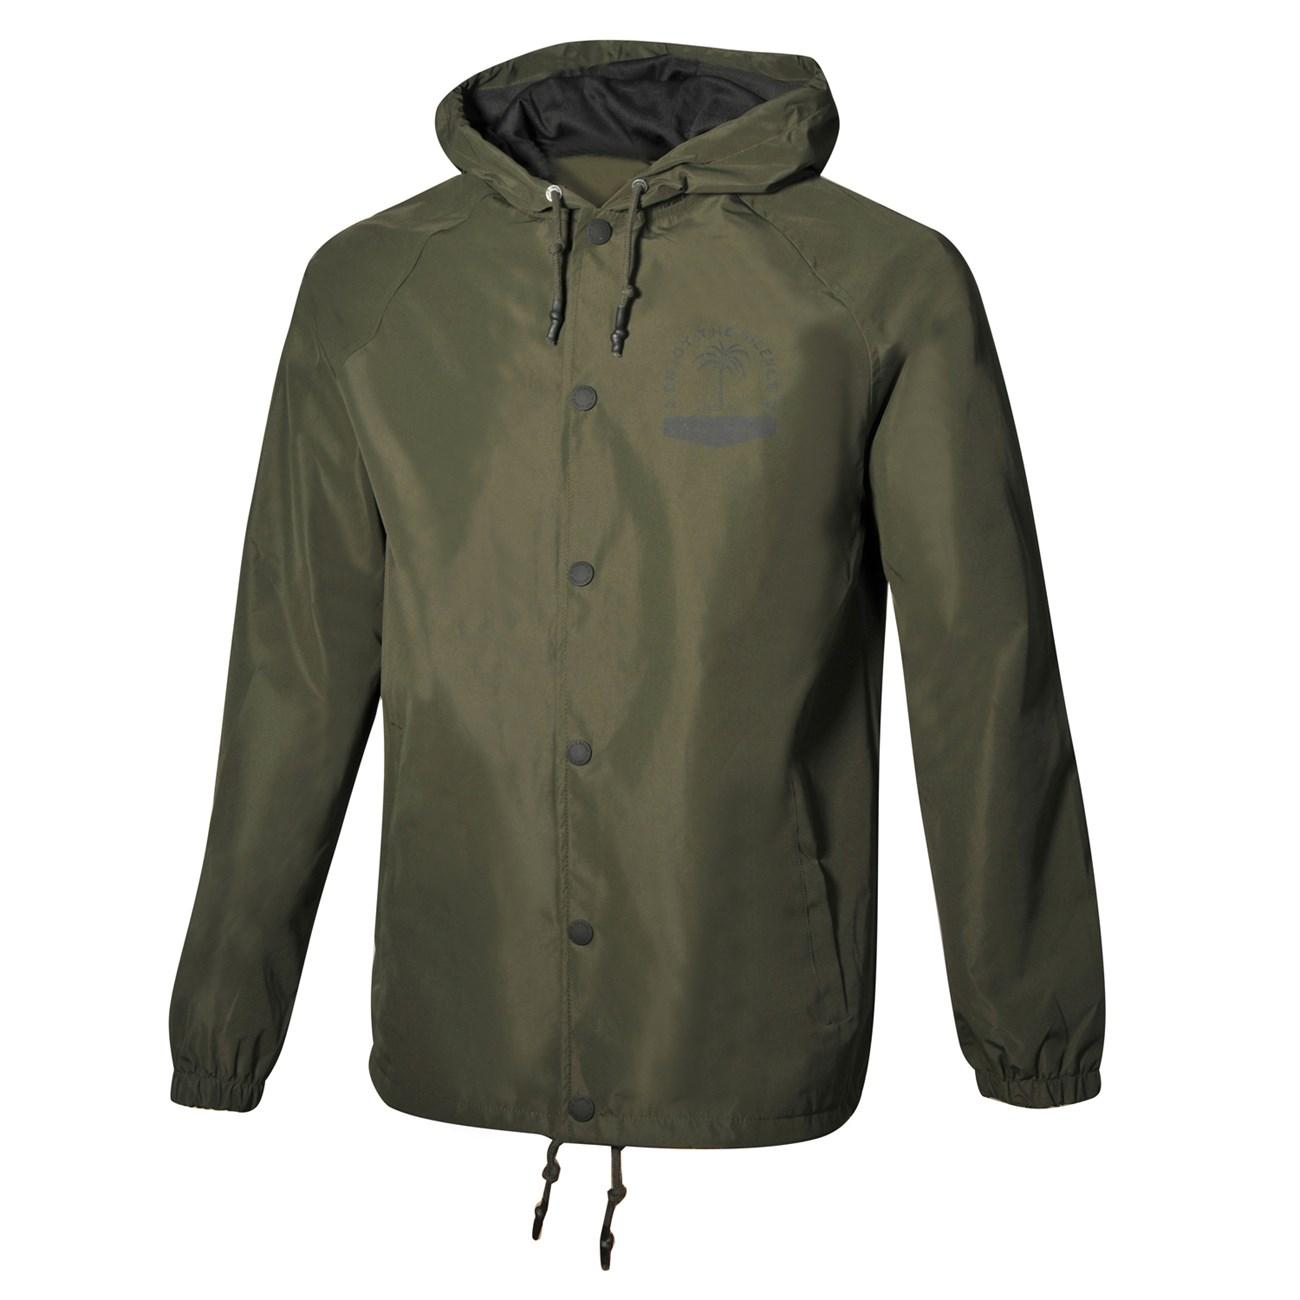 BASEHIT Men s jacket with hood   Συλλογή Μπουφάν  ad01e795de1